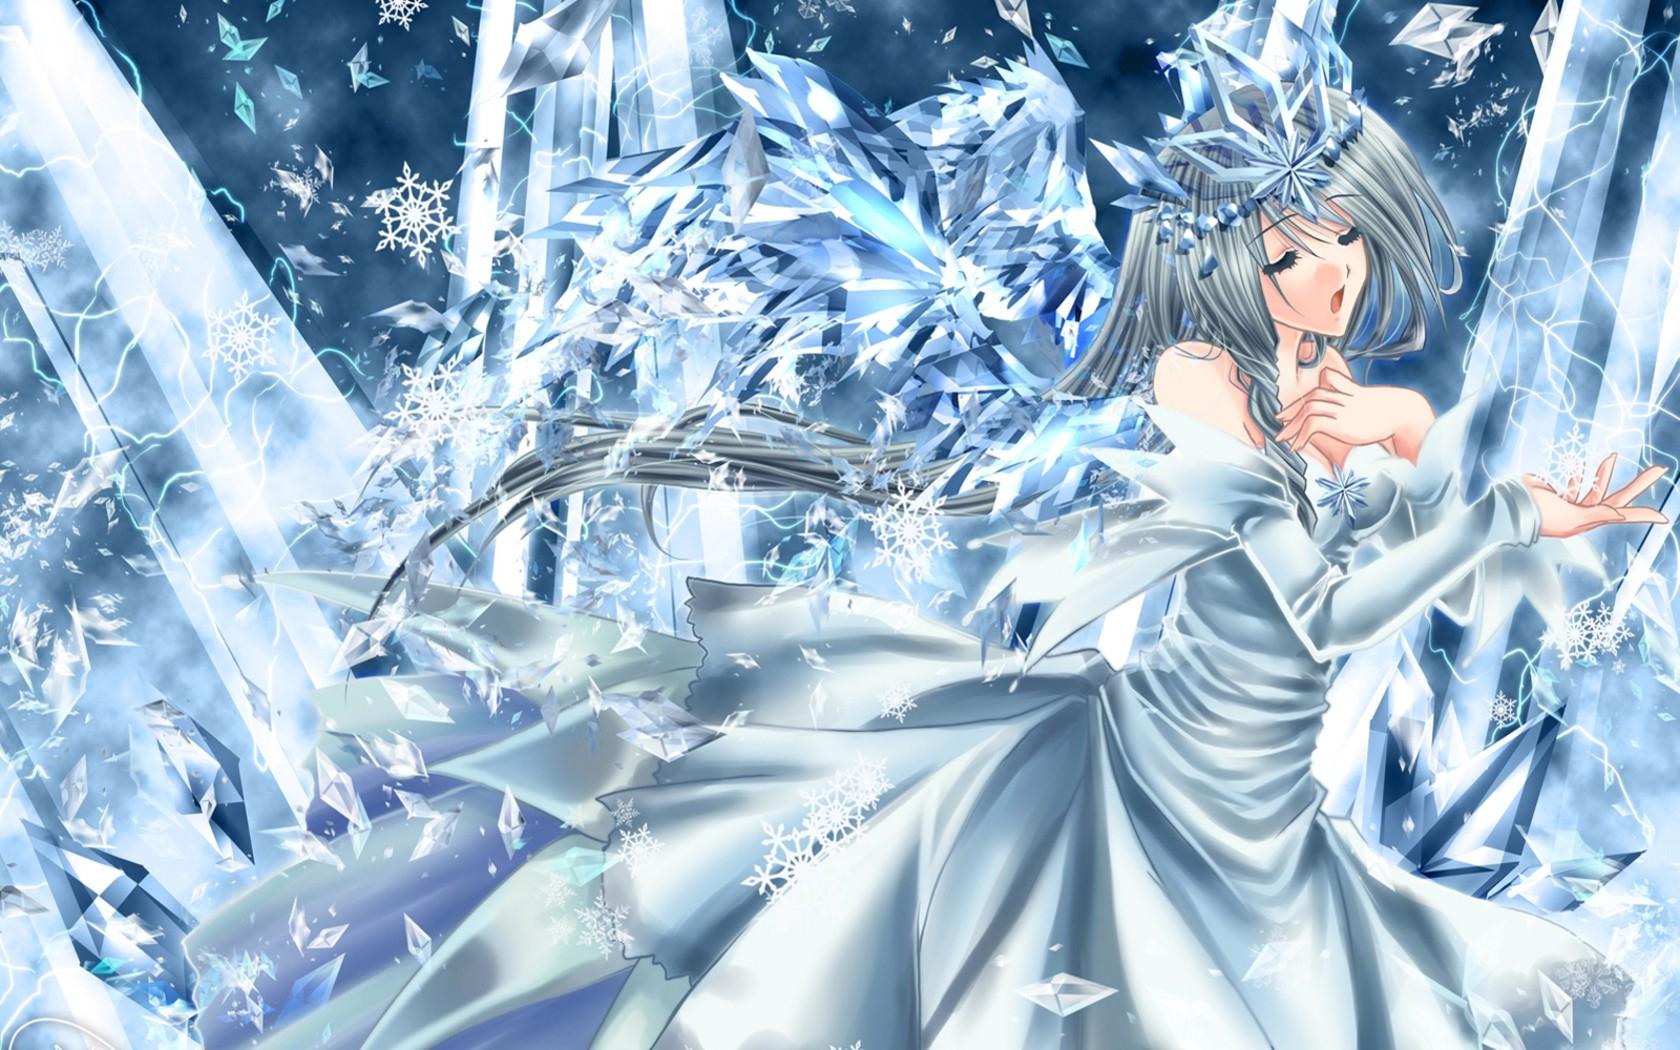 Anime girl winter cold dress